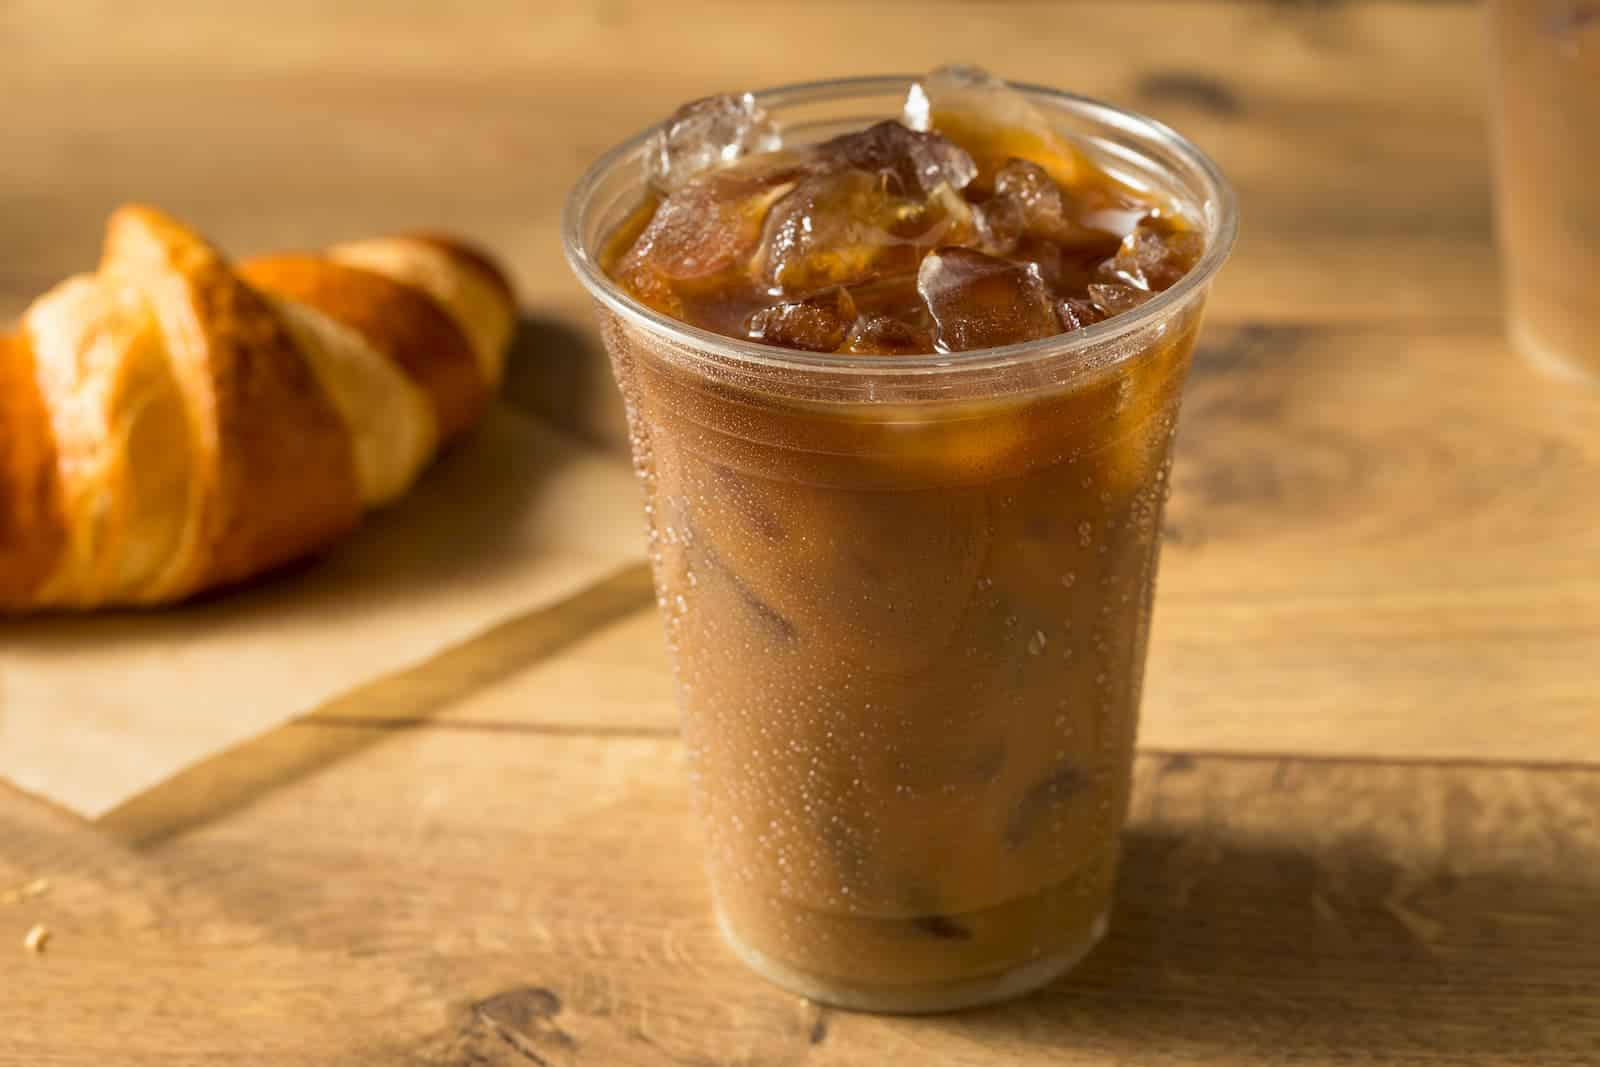 bebida preparada a base de café